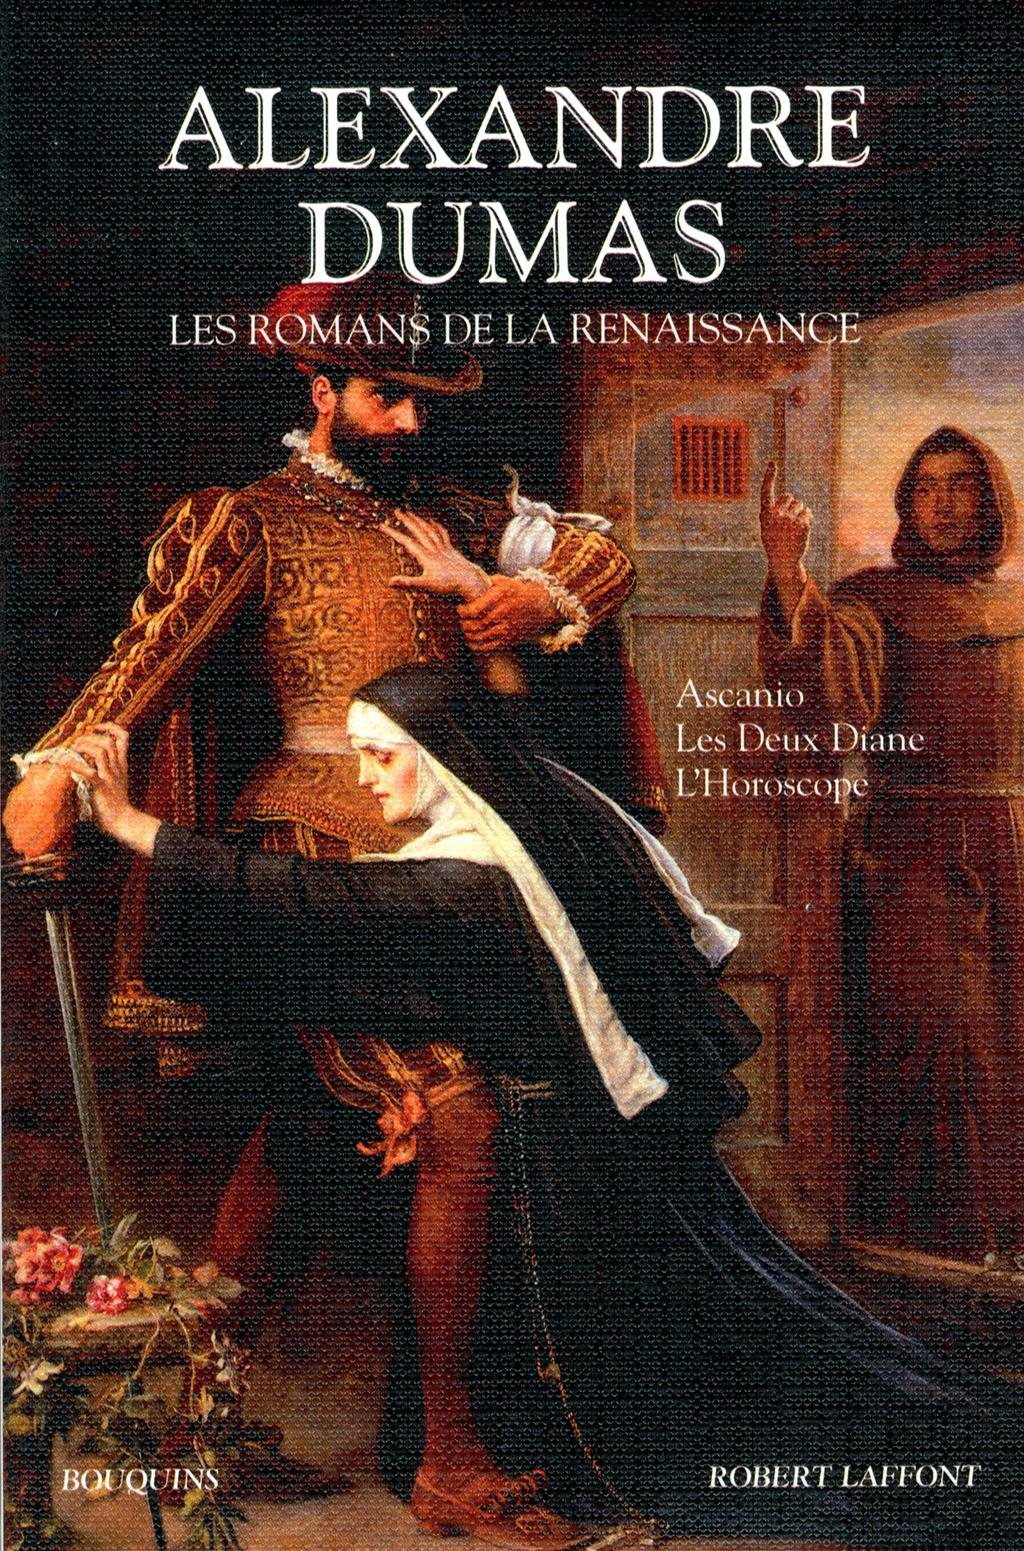 Dumas Alexander. Novels in the Renaissance: a selection of sites